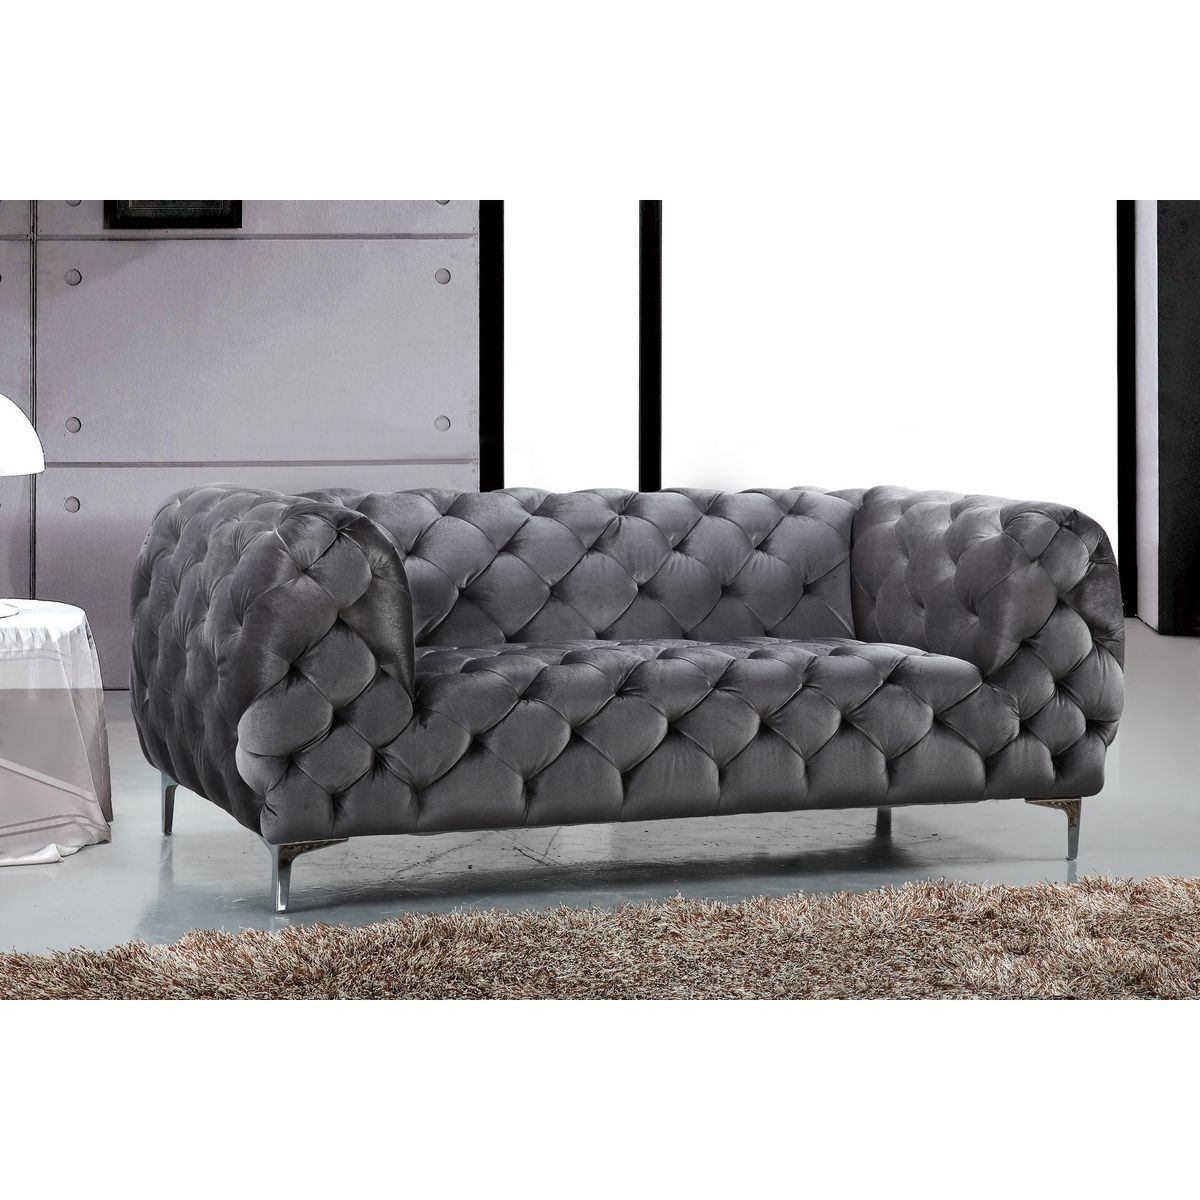 Most Current Furniture : Reclining Sofa Kijiji London Chesterfield Sofa Feet With Regard To Kijiji London Sectional Sofas (View 4 of 15)